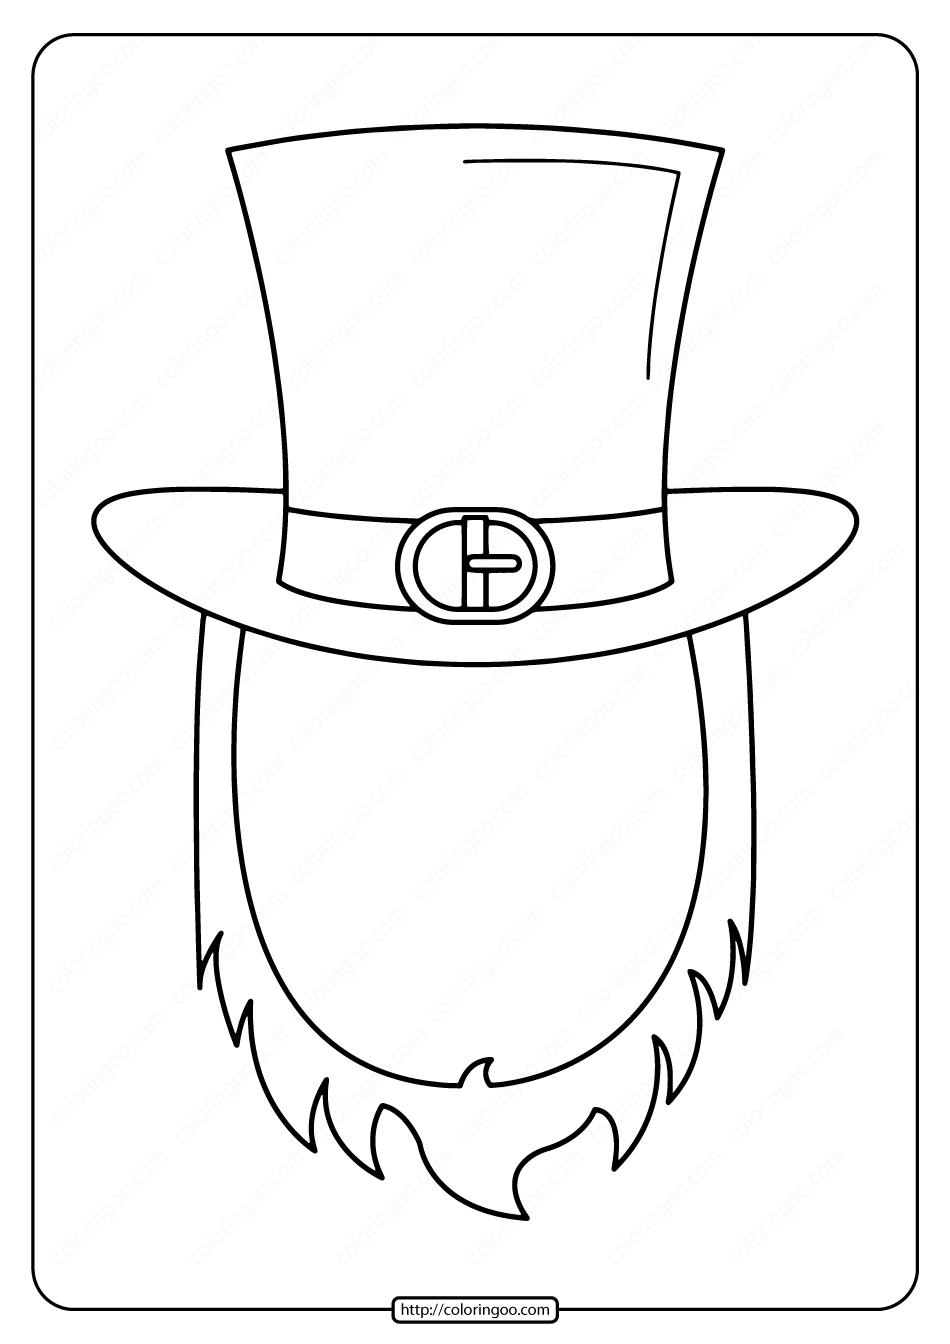 Free Printable Leprechaun Mask Frame Coloring